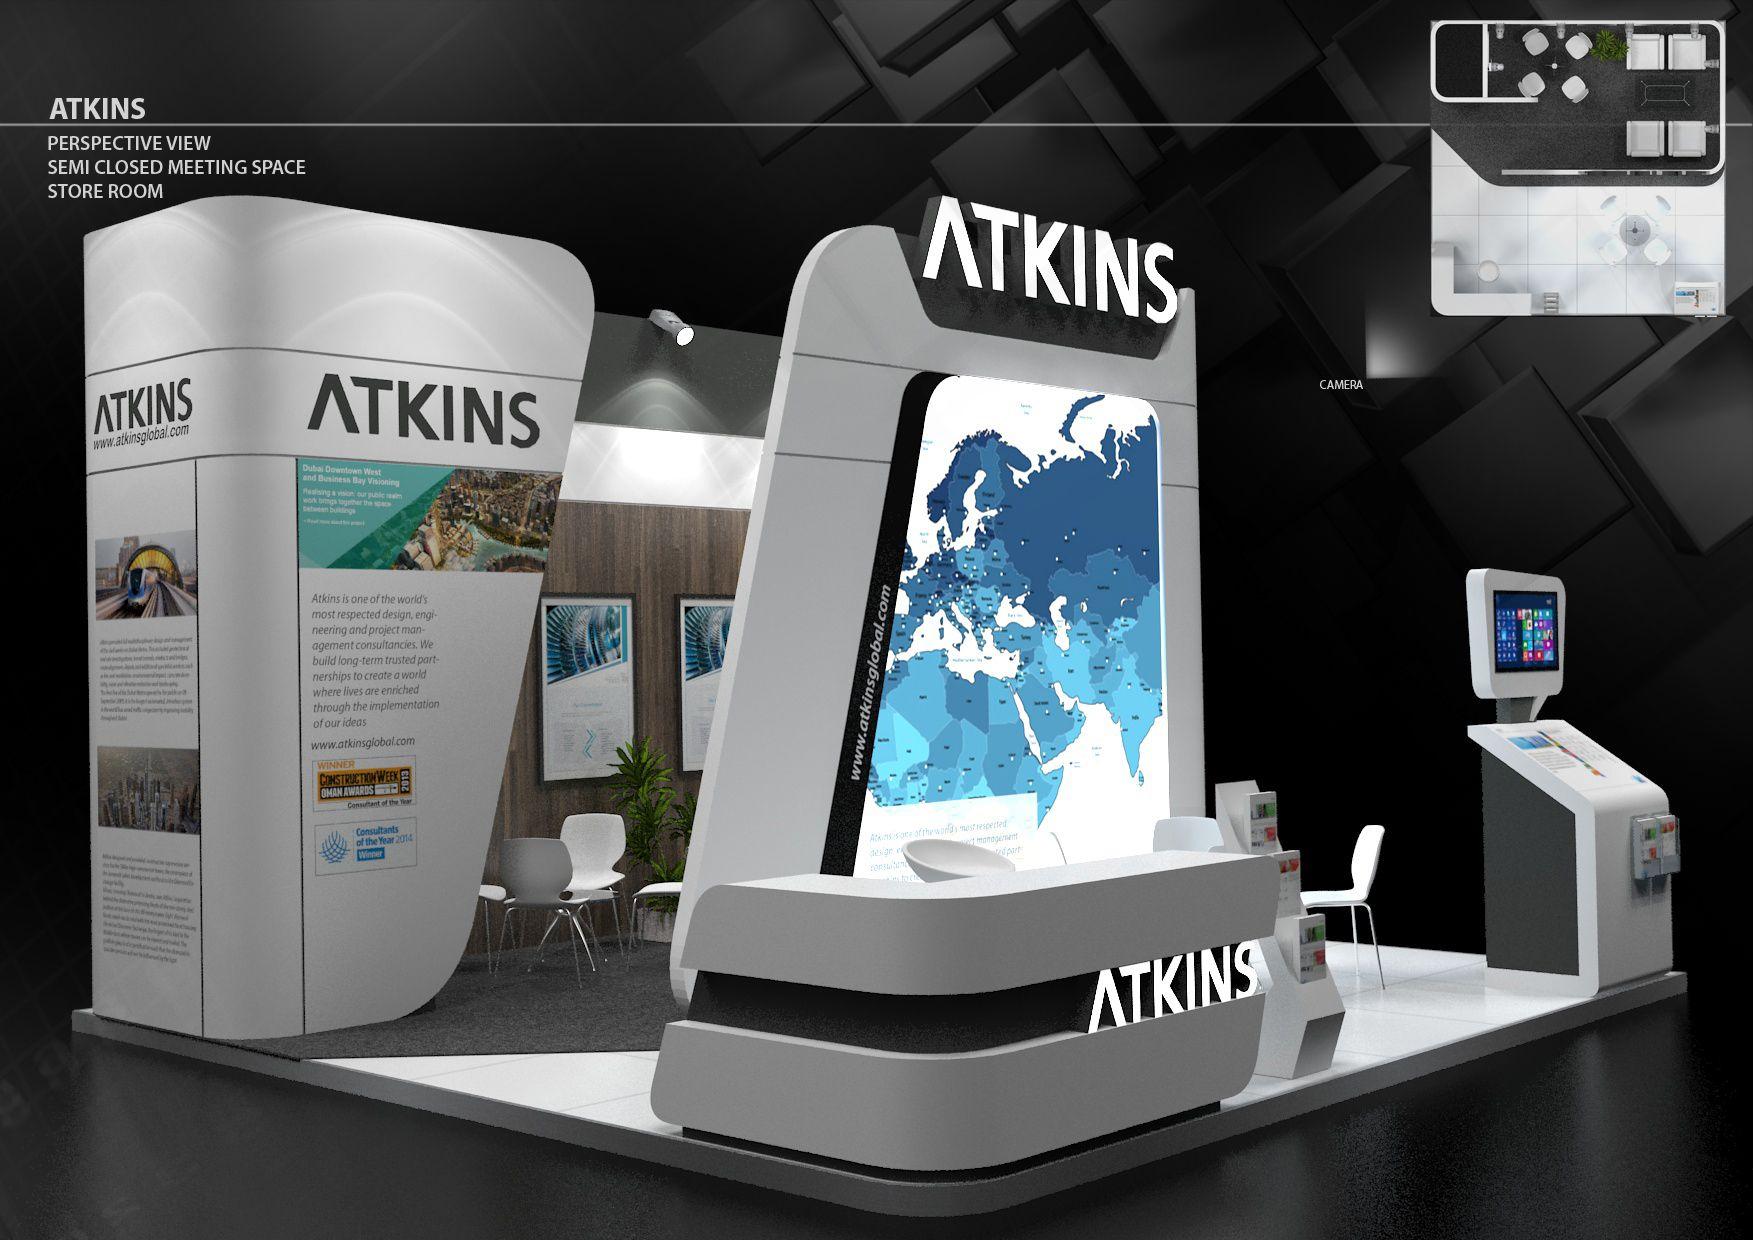 Exhibition Stall Design Layout : Exhibition stand designs 展位 pinterest